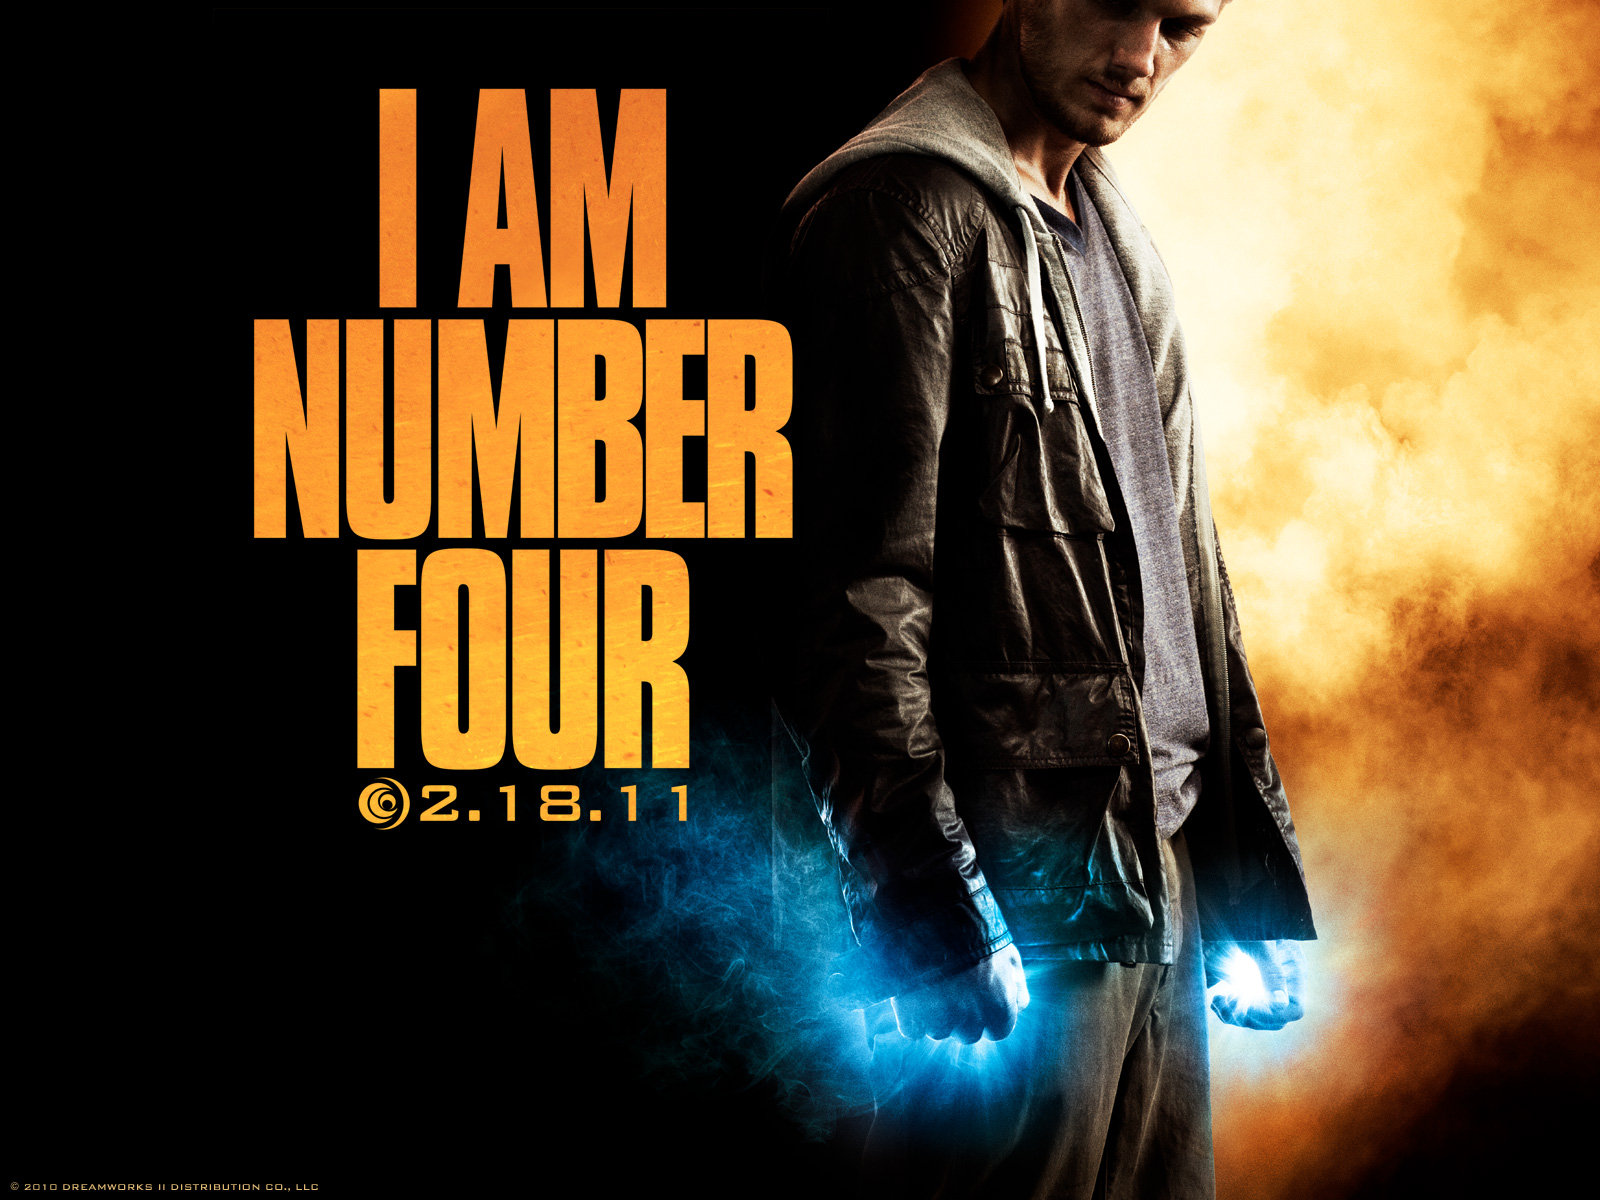 Vagebond's Movie ScreenShots: I Am Number Four (2011) I Am Number Four Movie Poster